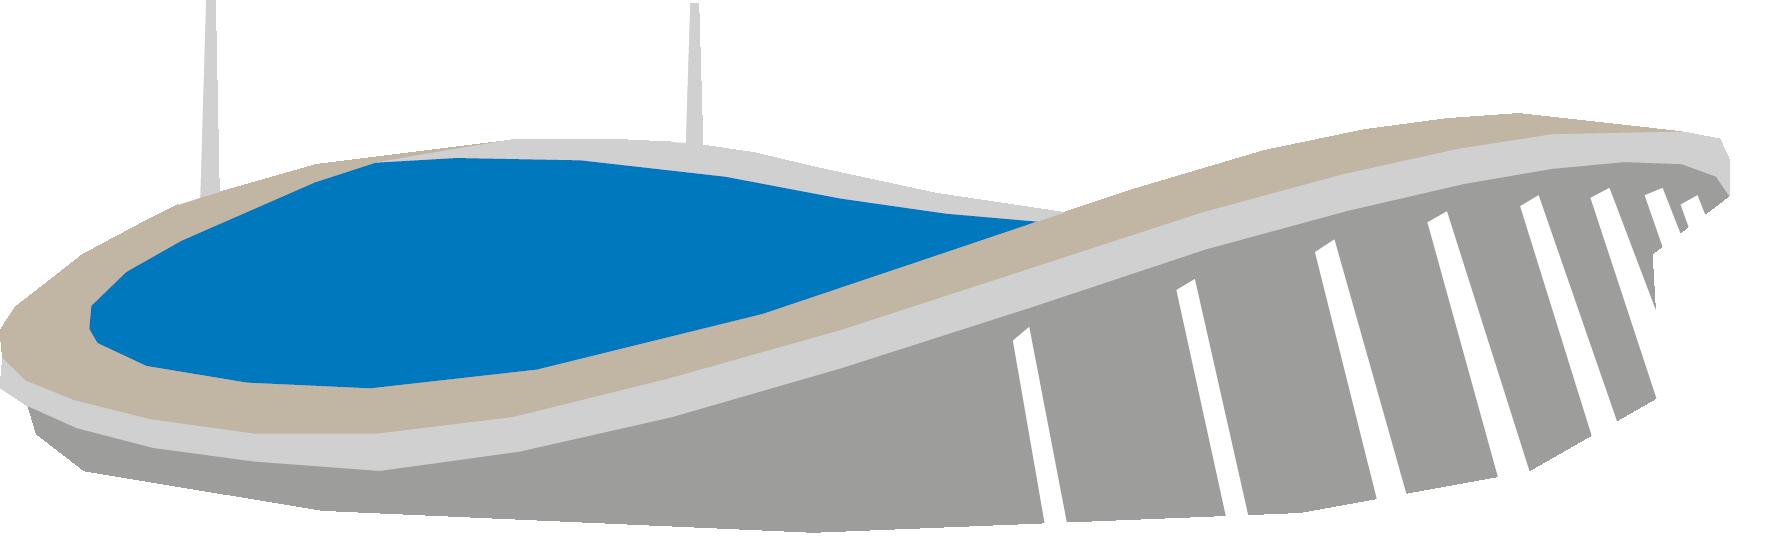 Ullevi-01.png